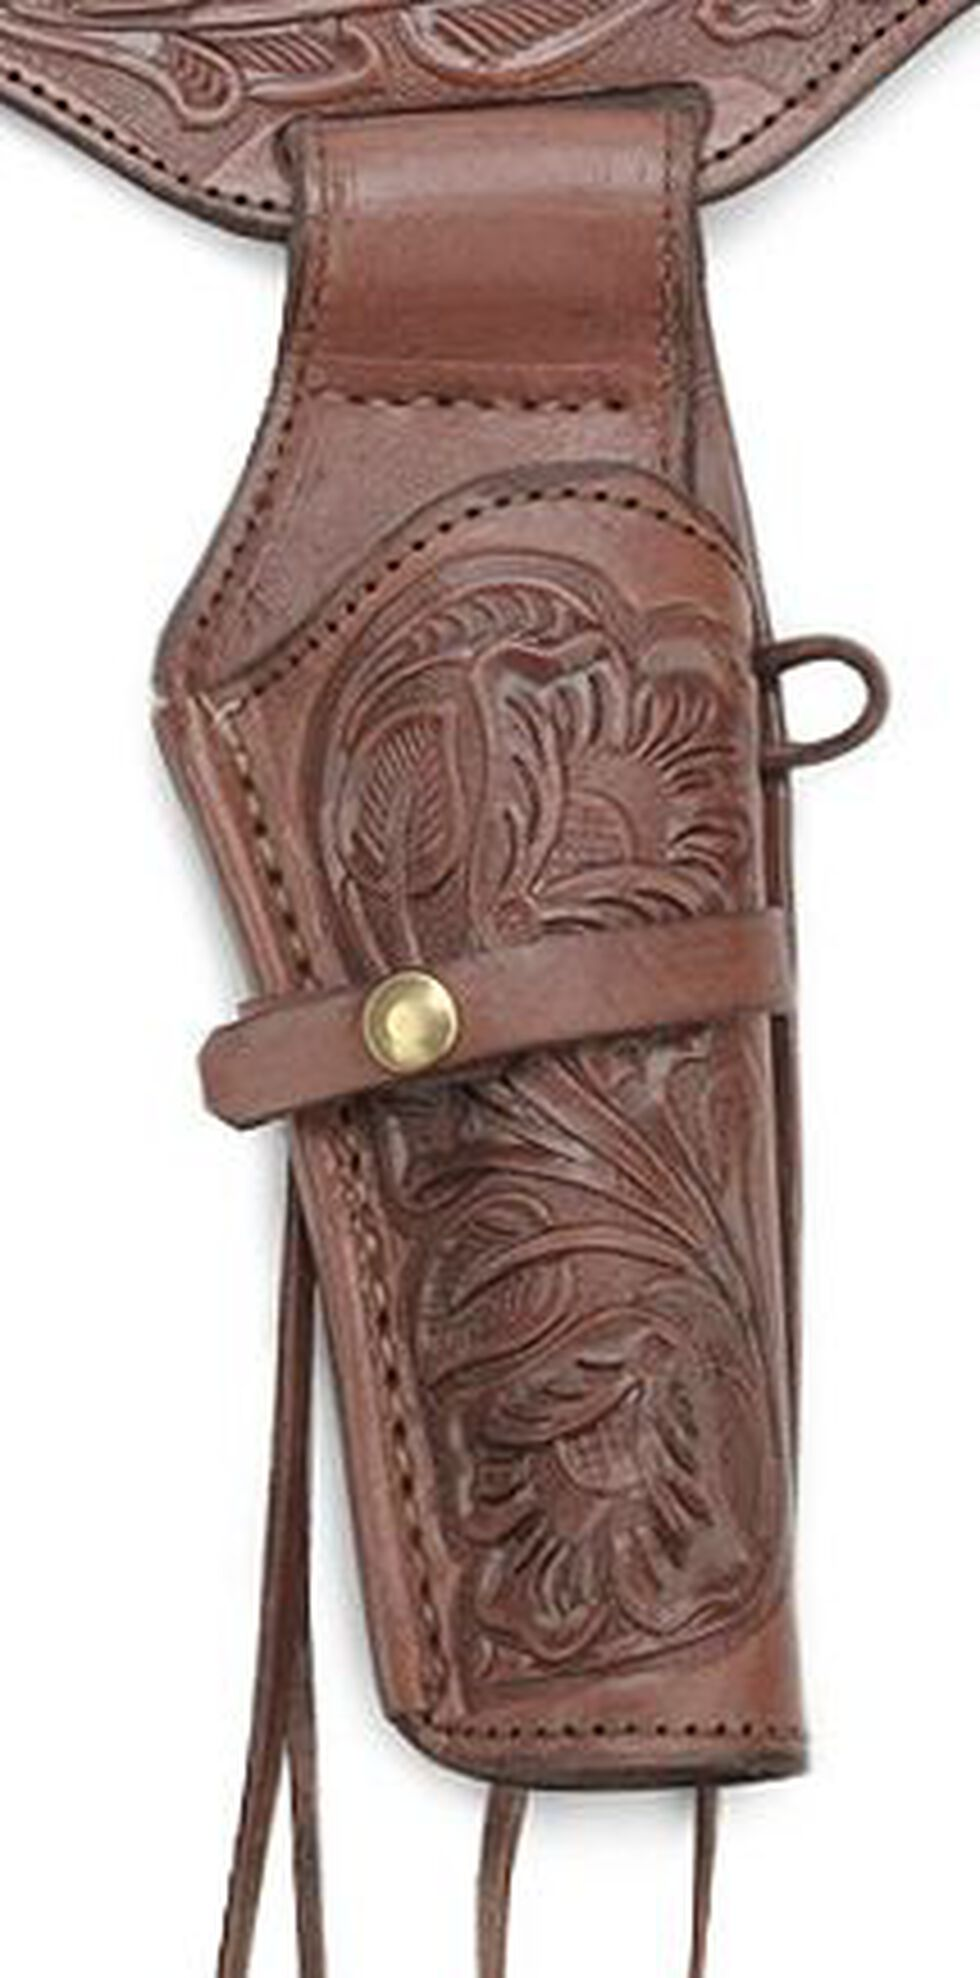 Western Express .38 Caliber Hand Tooled Leather Single-Gun Belt & Holster, Chocolate, hi-res